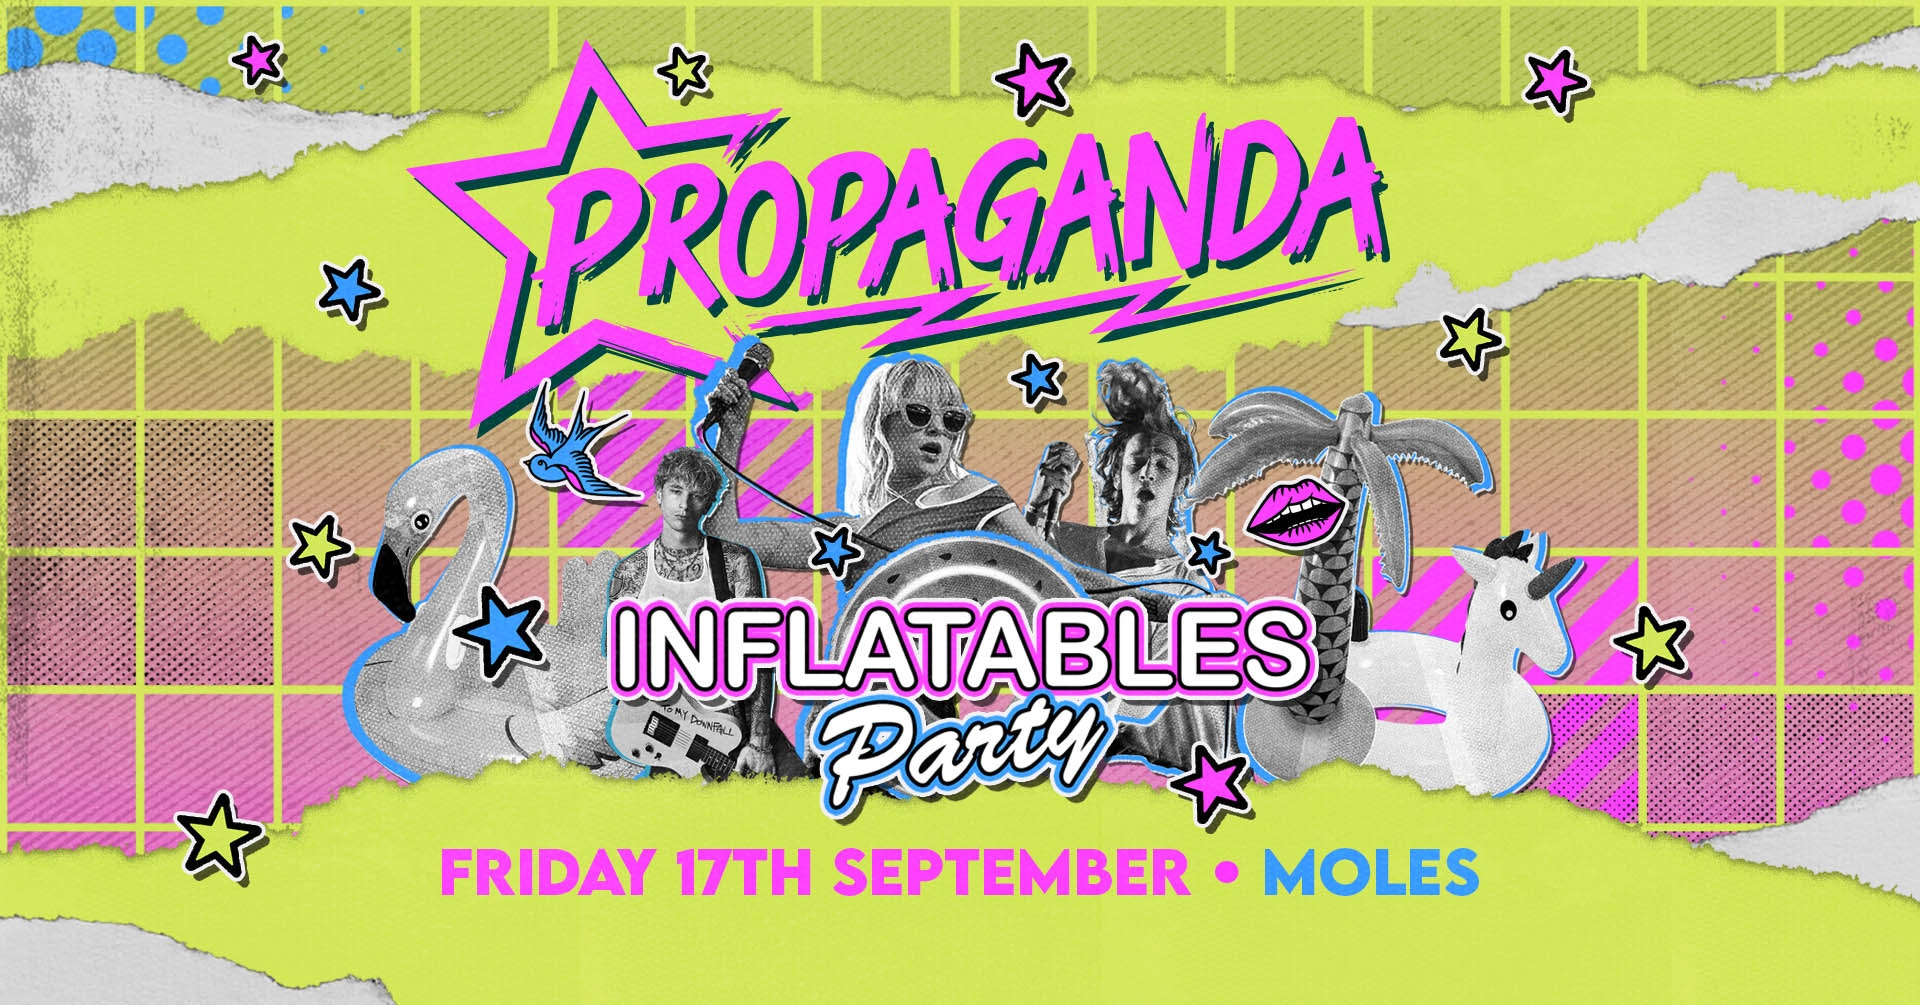 Propaganda Bath – Inflatables Party!